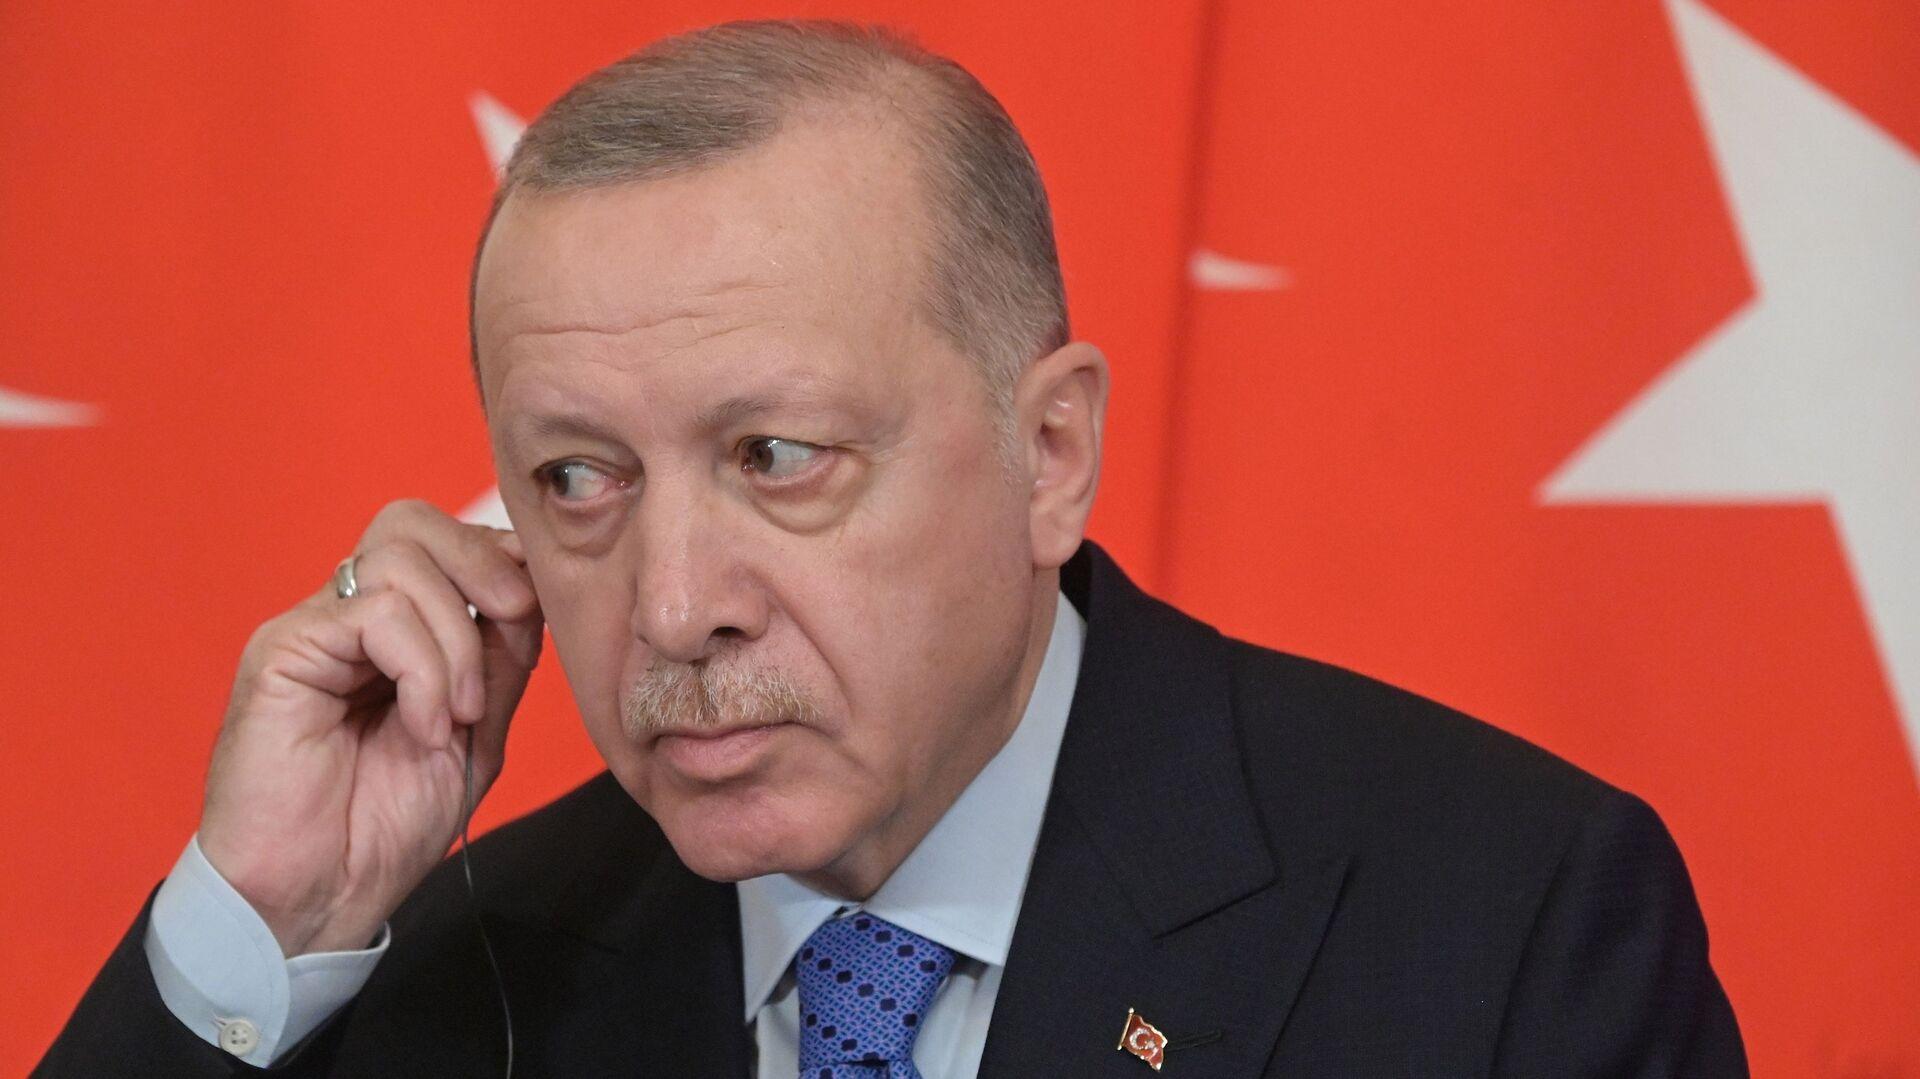 Президент Турции Реджеп Тайип Эрдоган - Sputnik Тоҷикистон, 1920, 21.09.2021